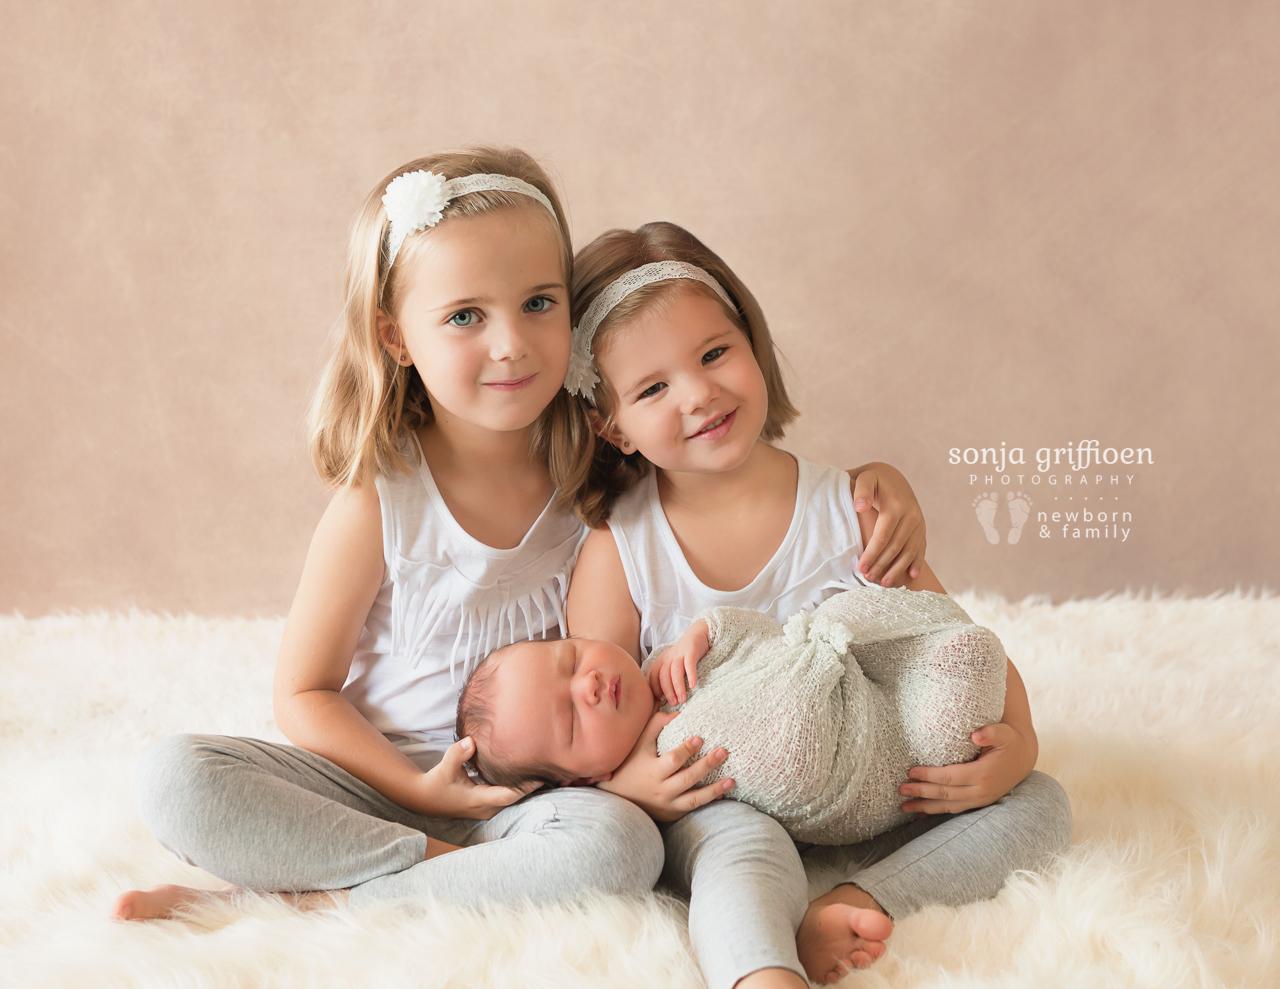 Lukas-Newborn-Brisbane-Newborn-Photographer-Sonja-Griffioen-11.jpg